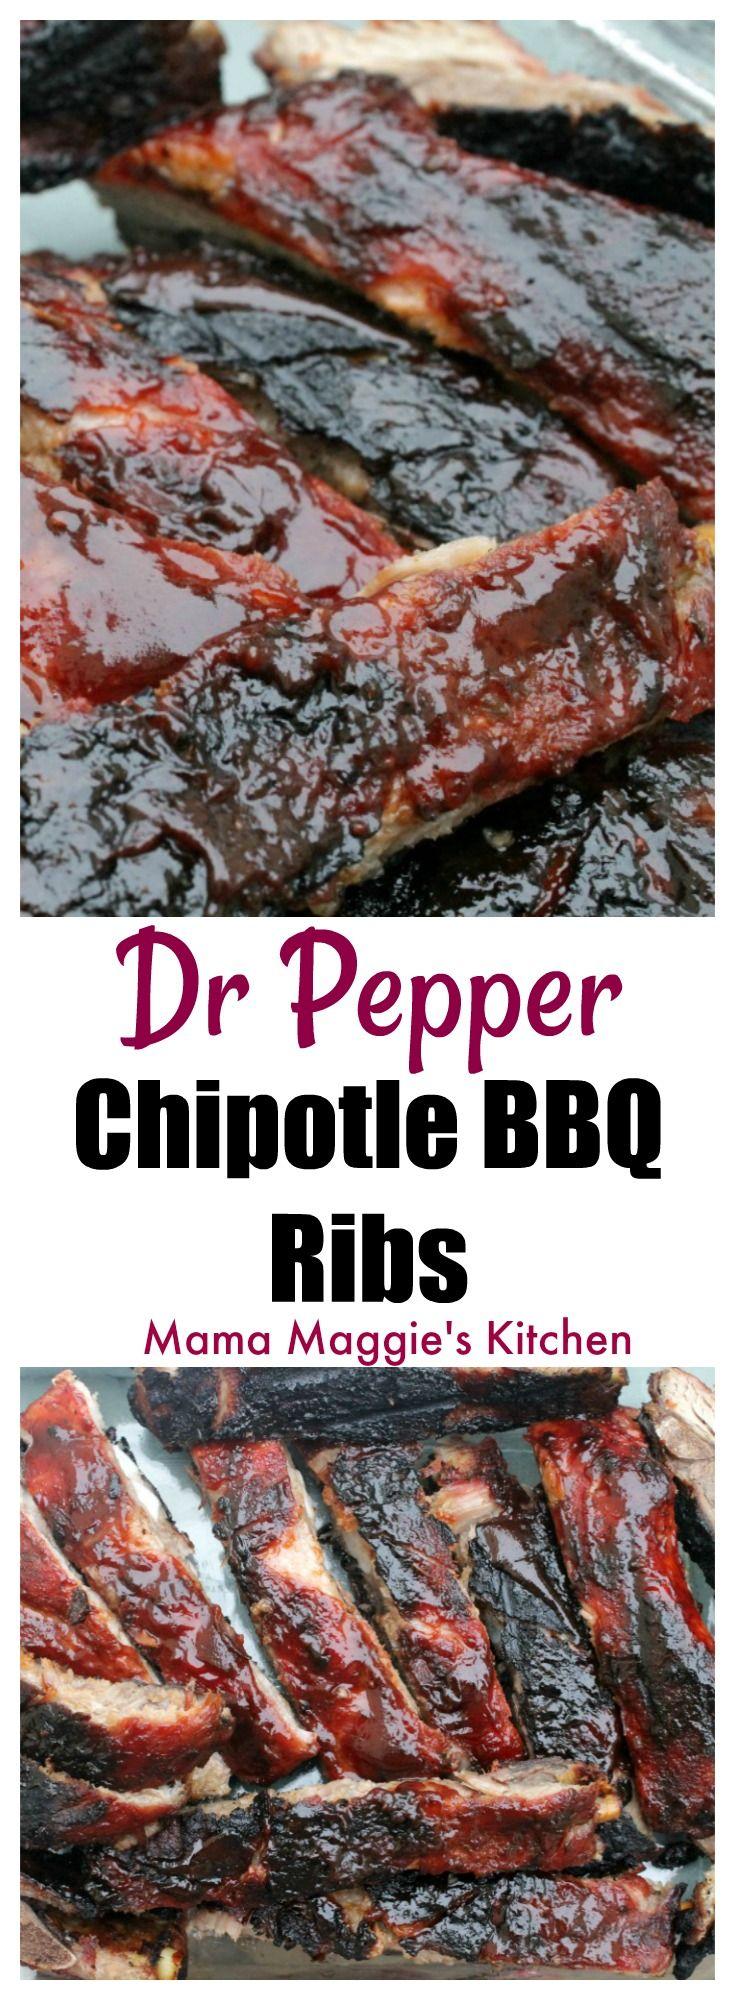 Dr. Pepper Chipotle BBQ Ribs - grill, grilling, BBQ - via @MamaMaggiesKitchen  #sponsored #GrillGatingHero #GrillGating